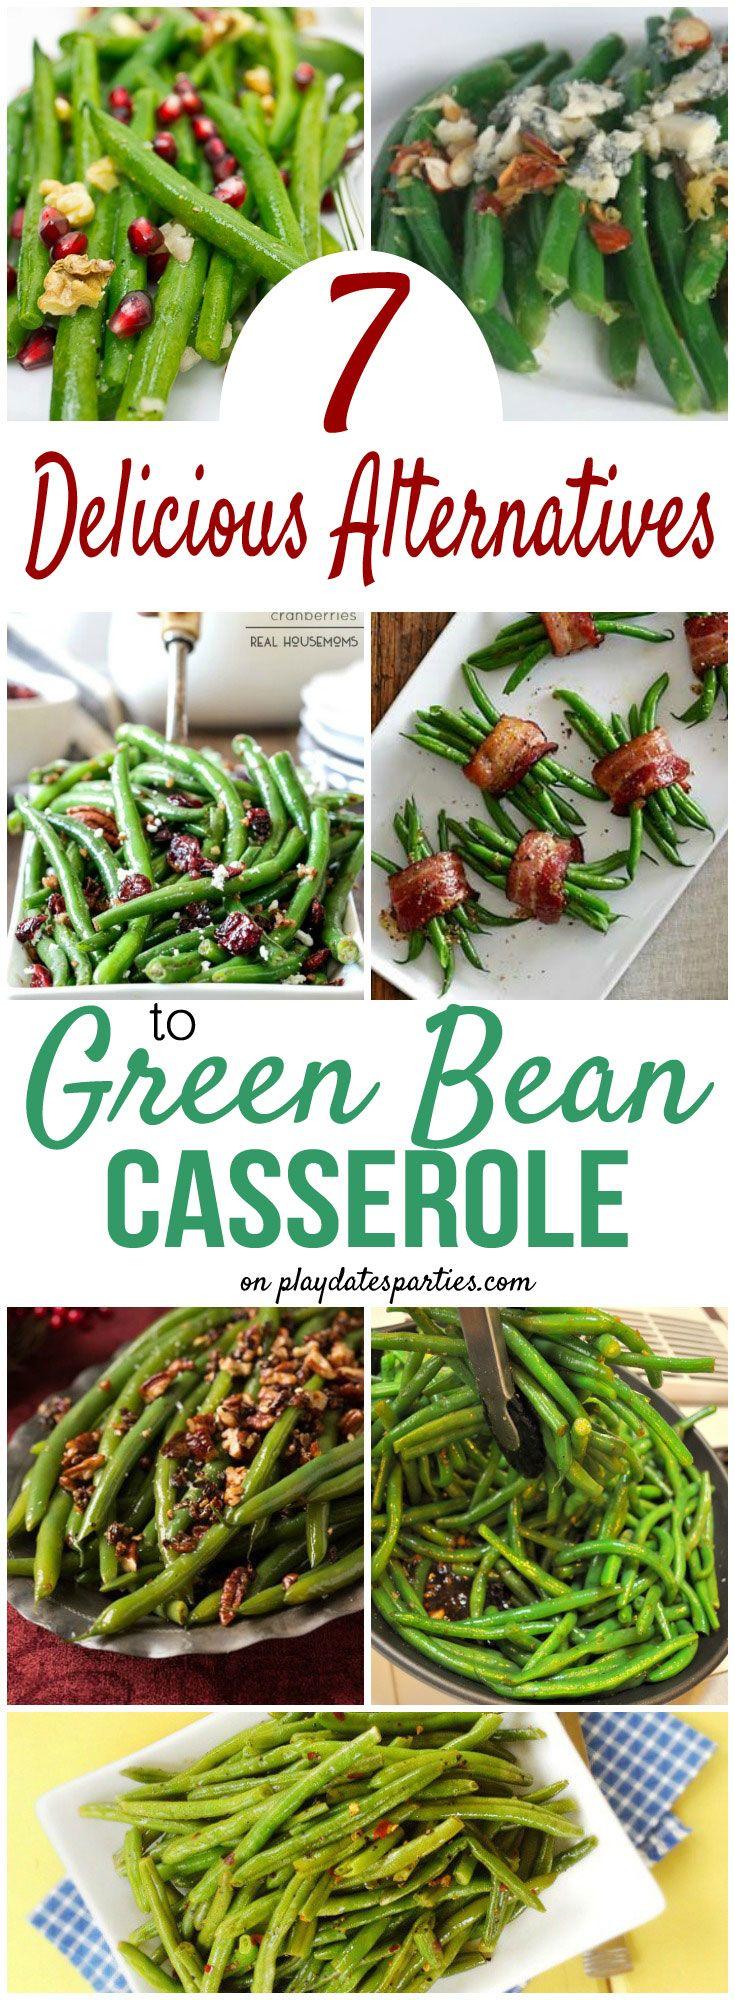 how to make canned green beans taste fresh